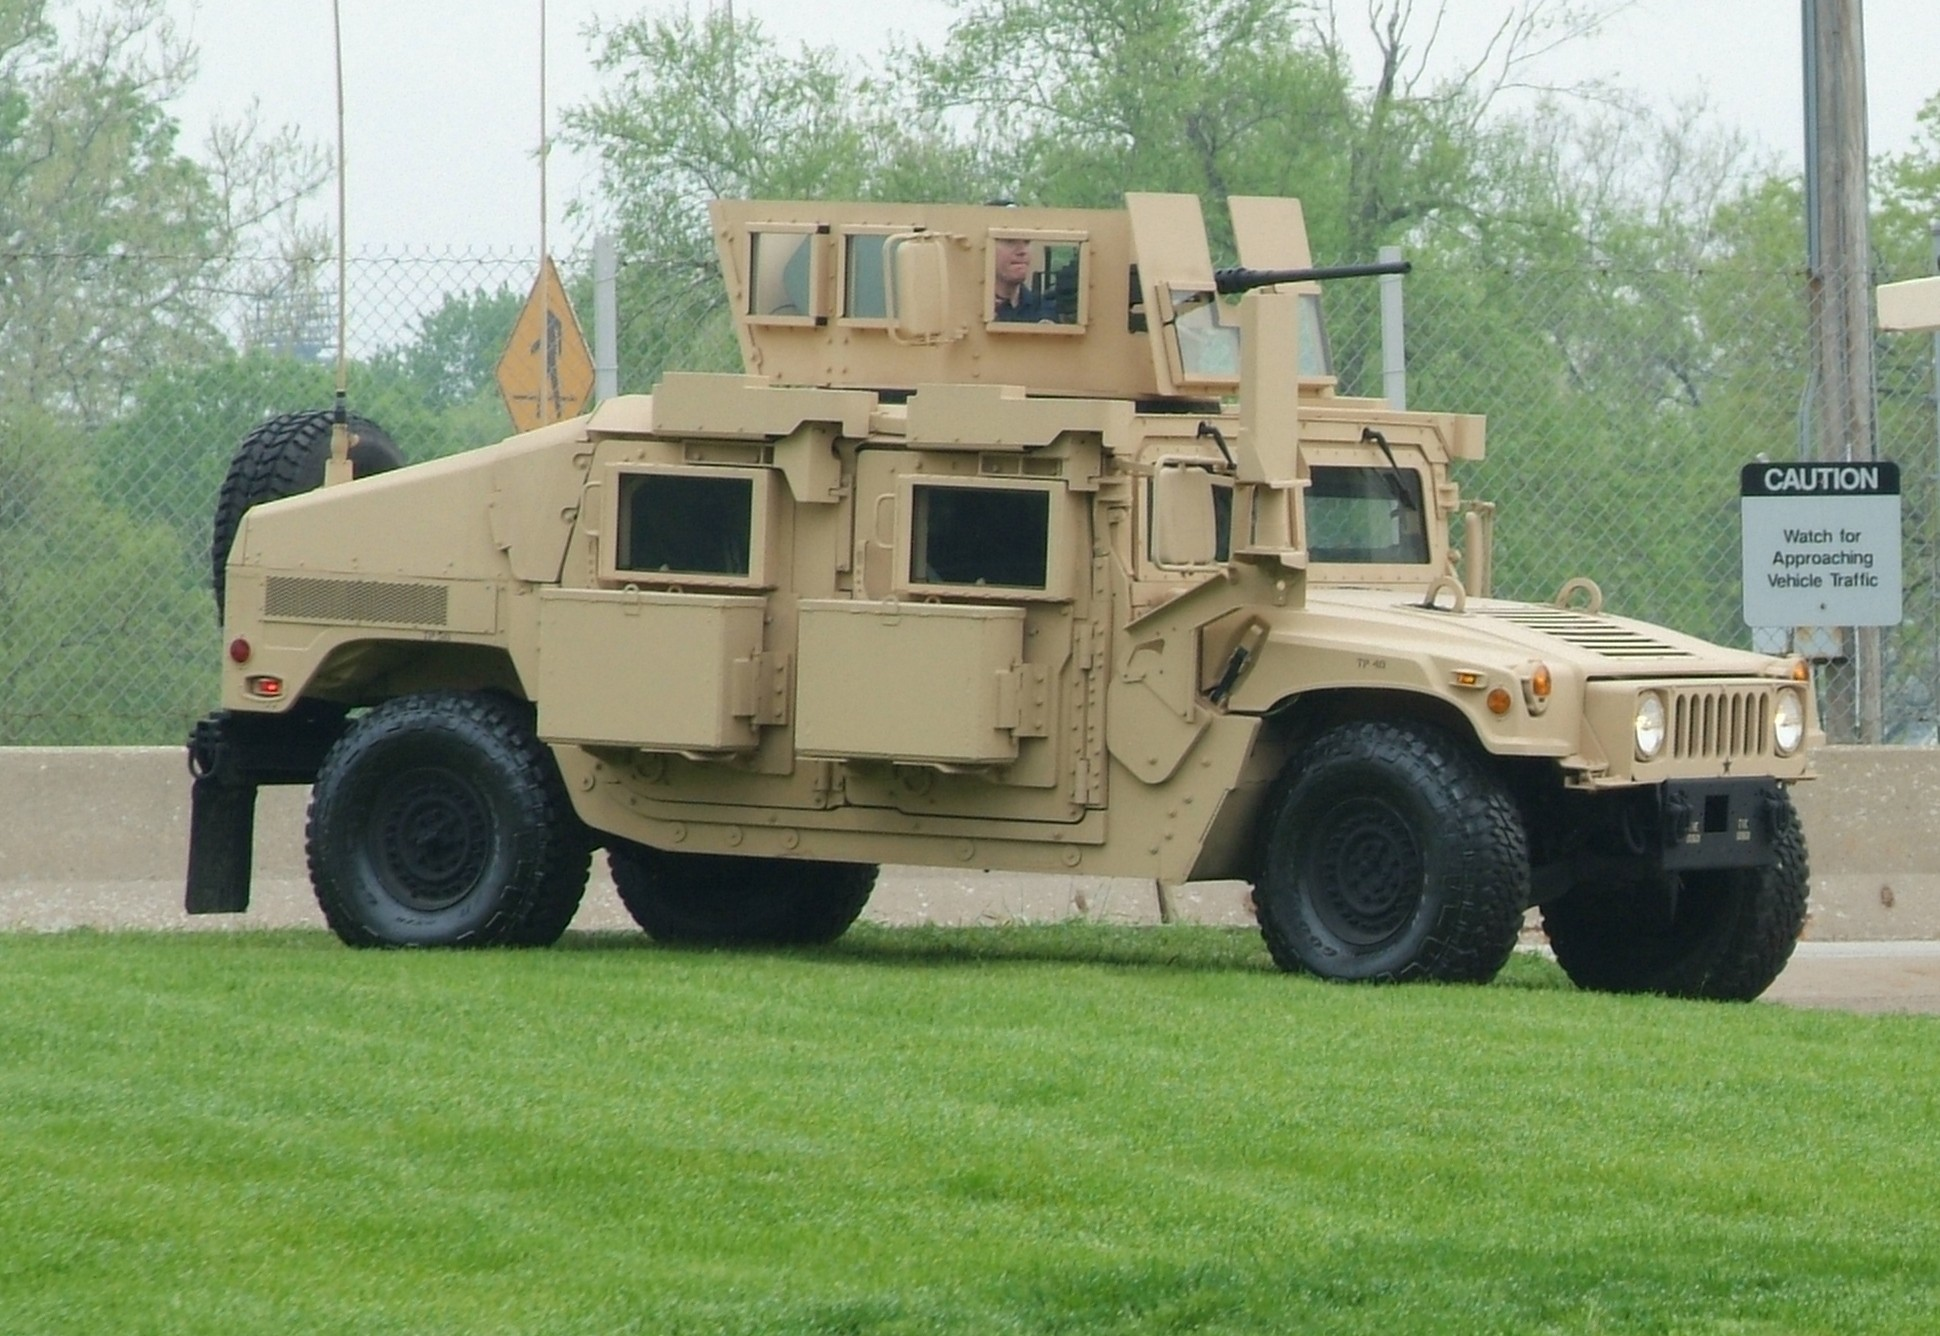 Ejercito Mexicano renueva flota de Humvees 02/04/2014 Army.mil-38037-2009-05-14-120548